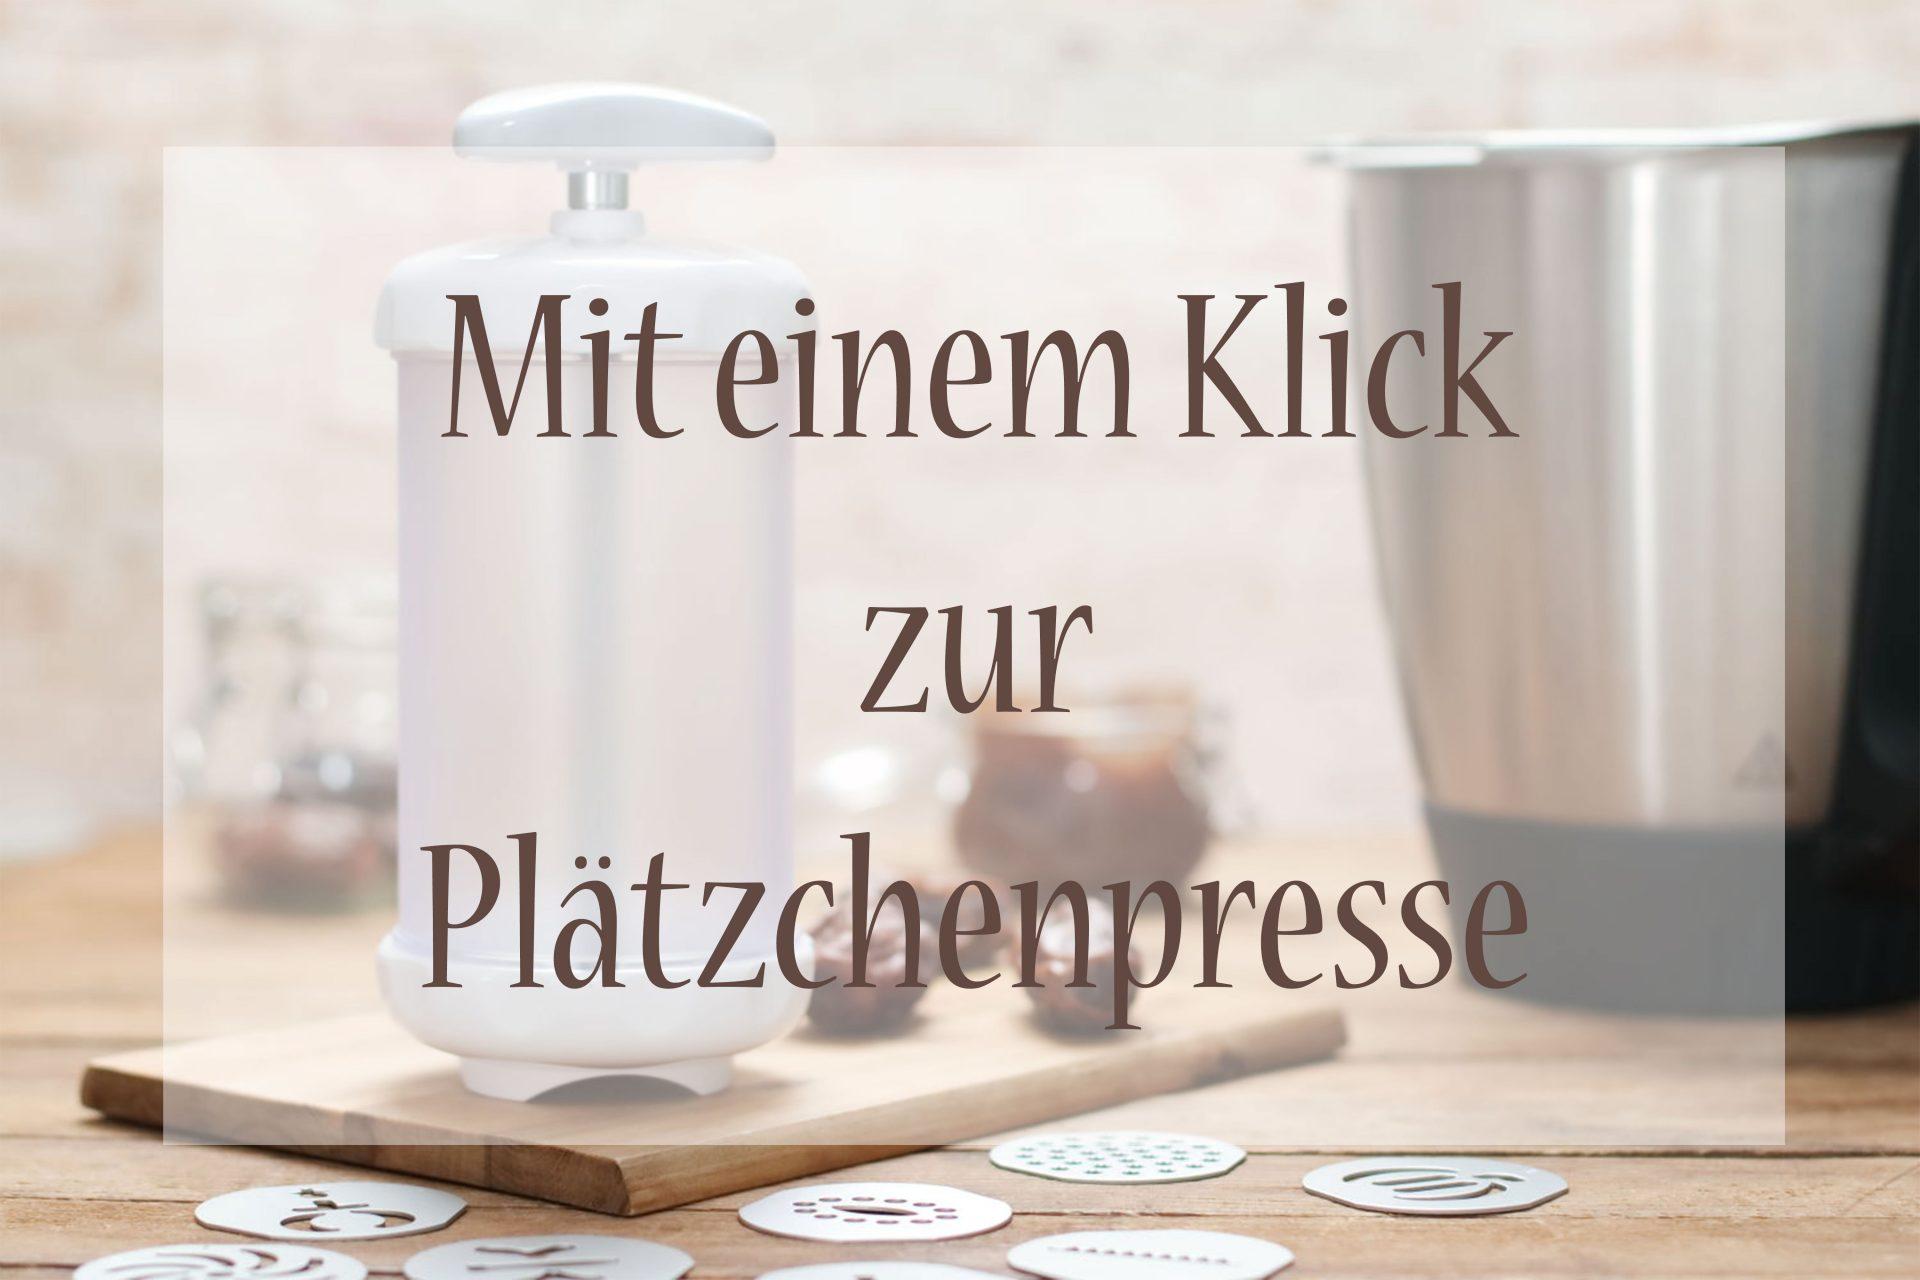 Plätzchenpresse Pampered Chef Foodrevers Clean Eating